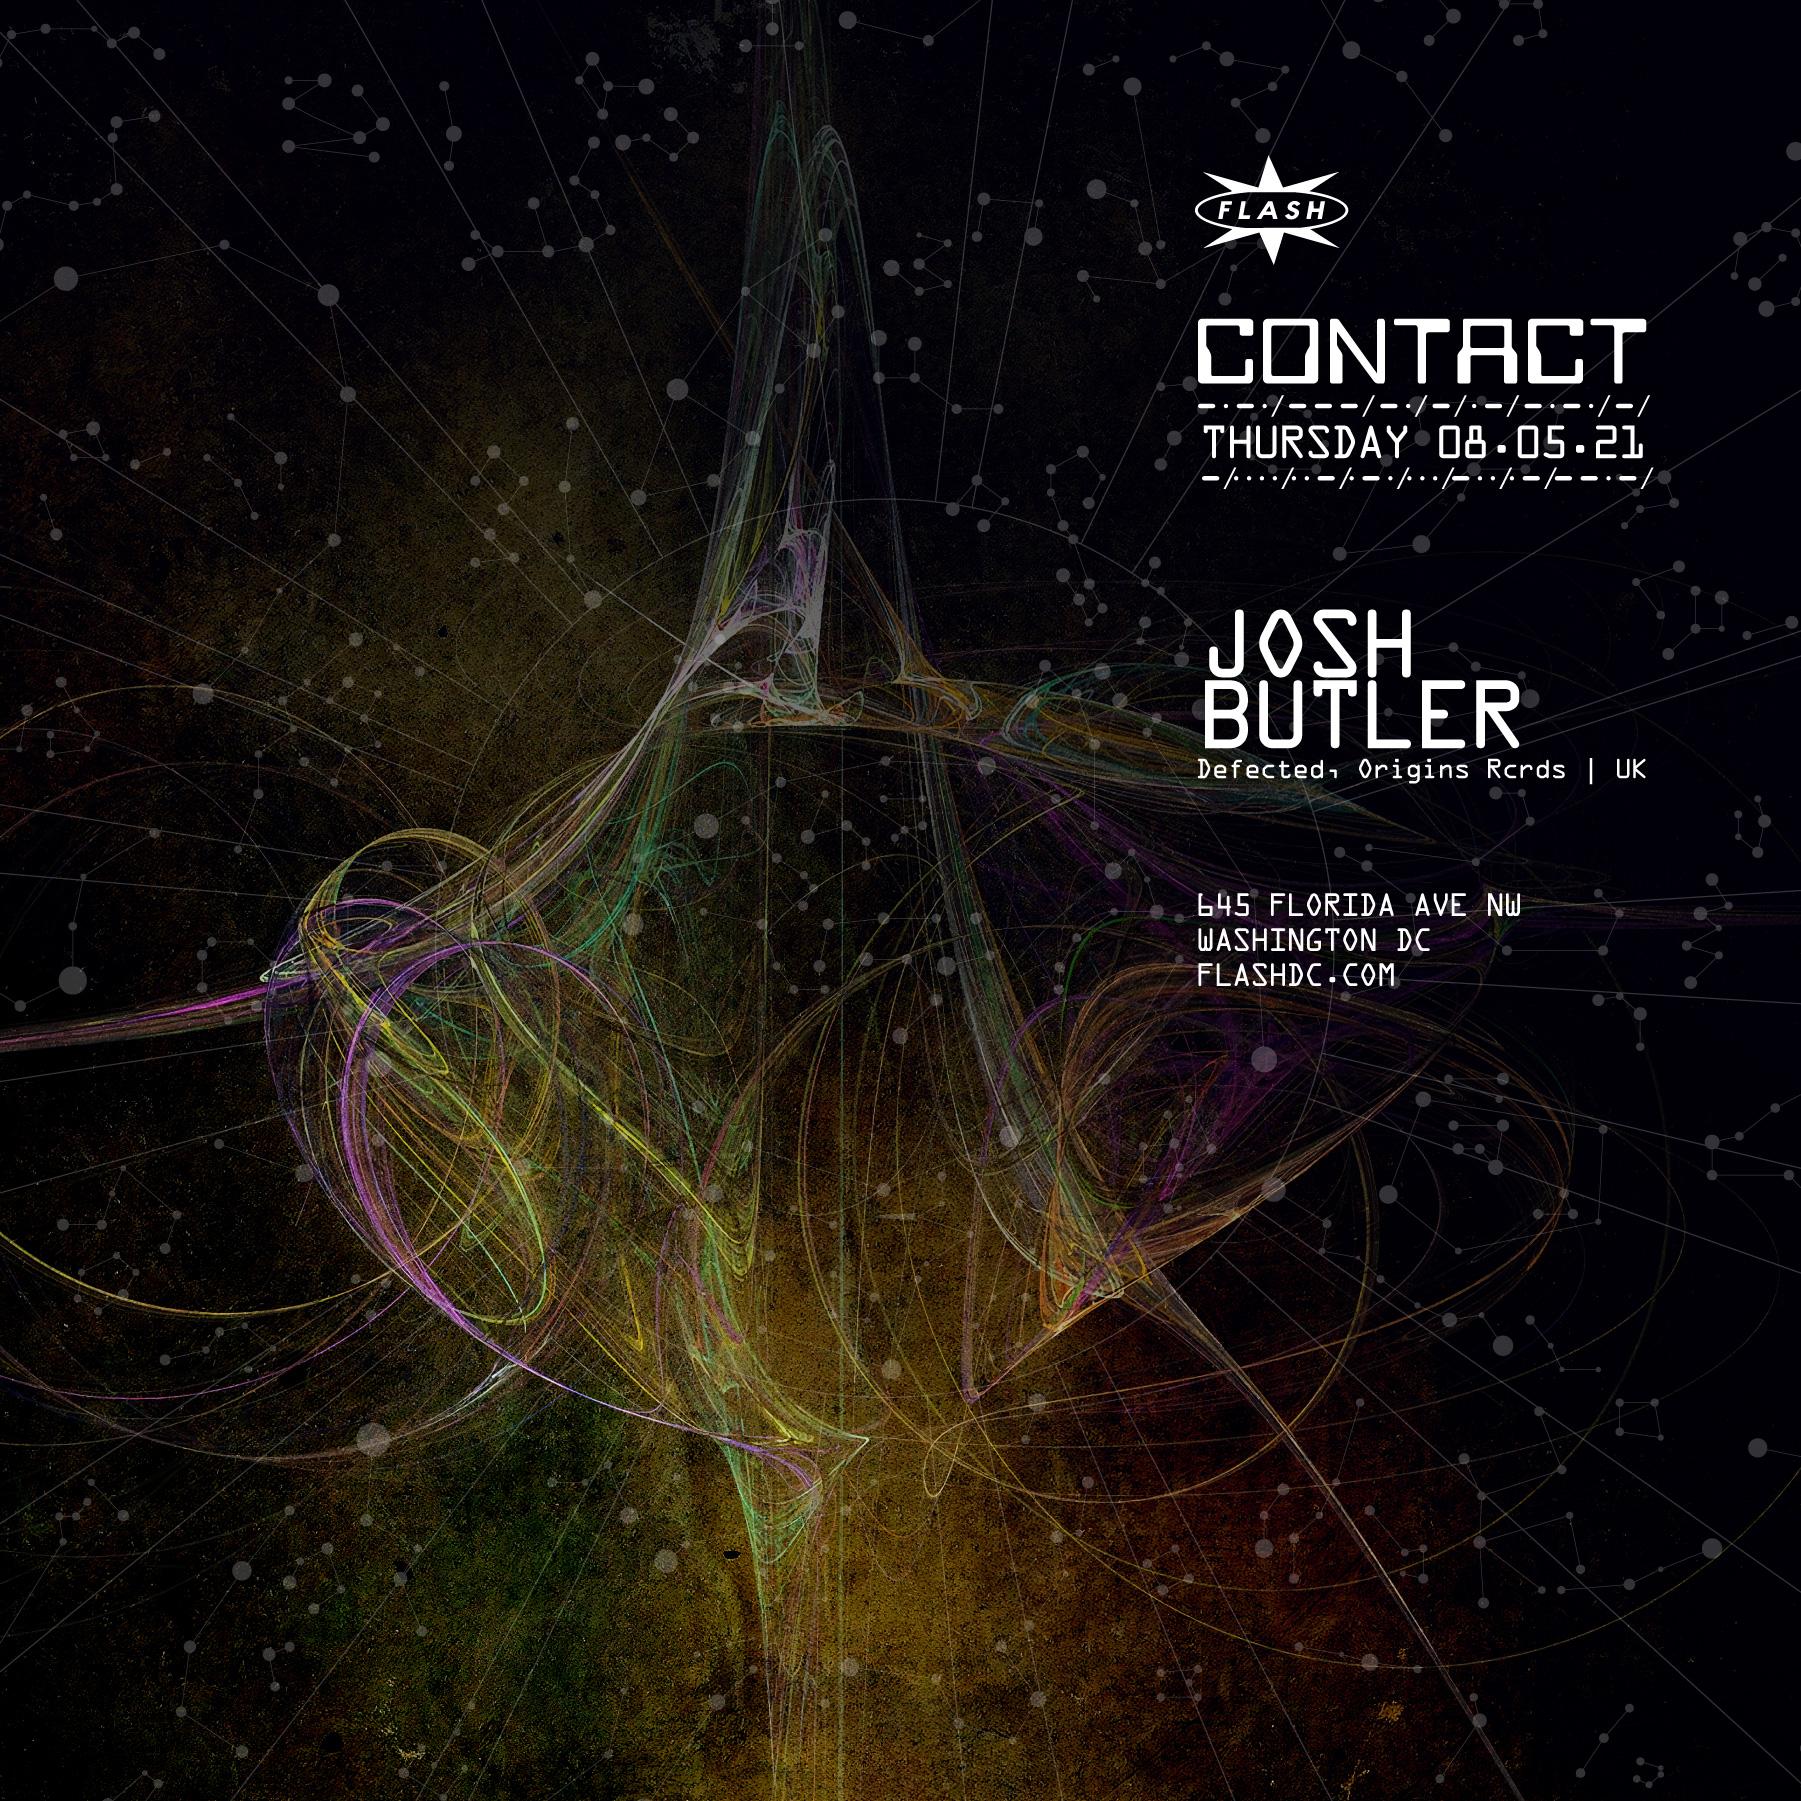 CONTACT: Josh Butler event thumbnail